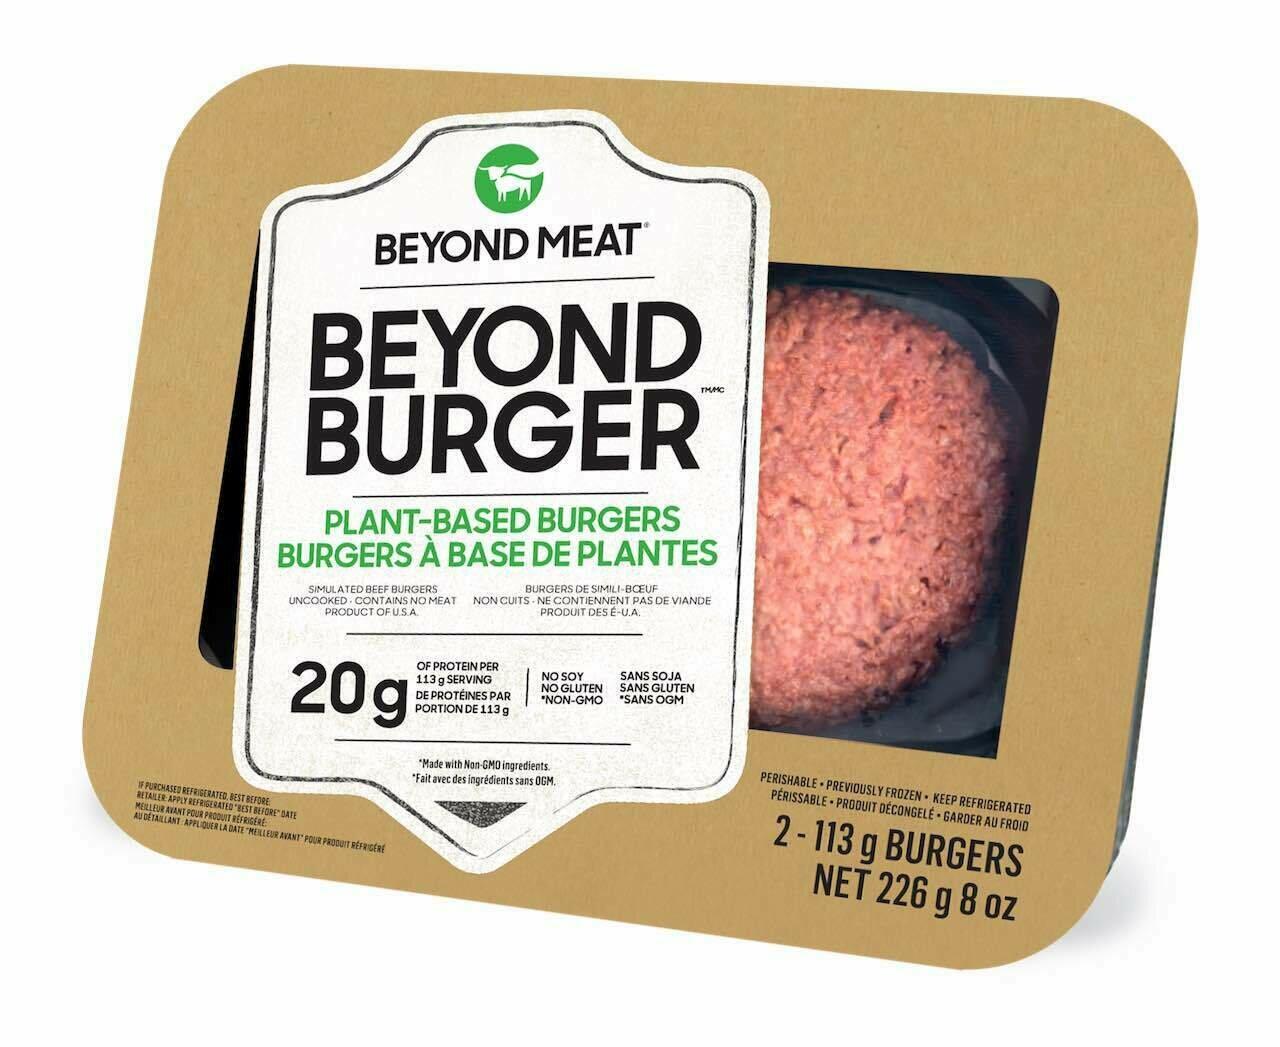 Beyond Meat - Vegan Burgers